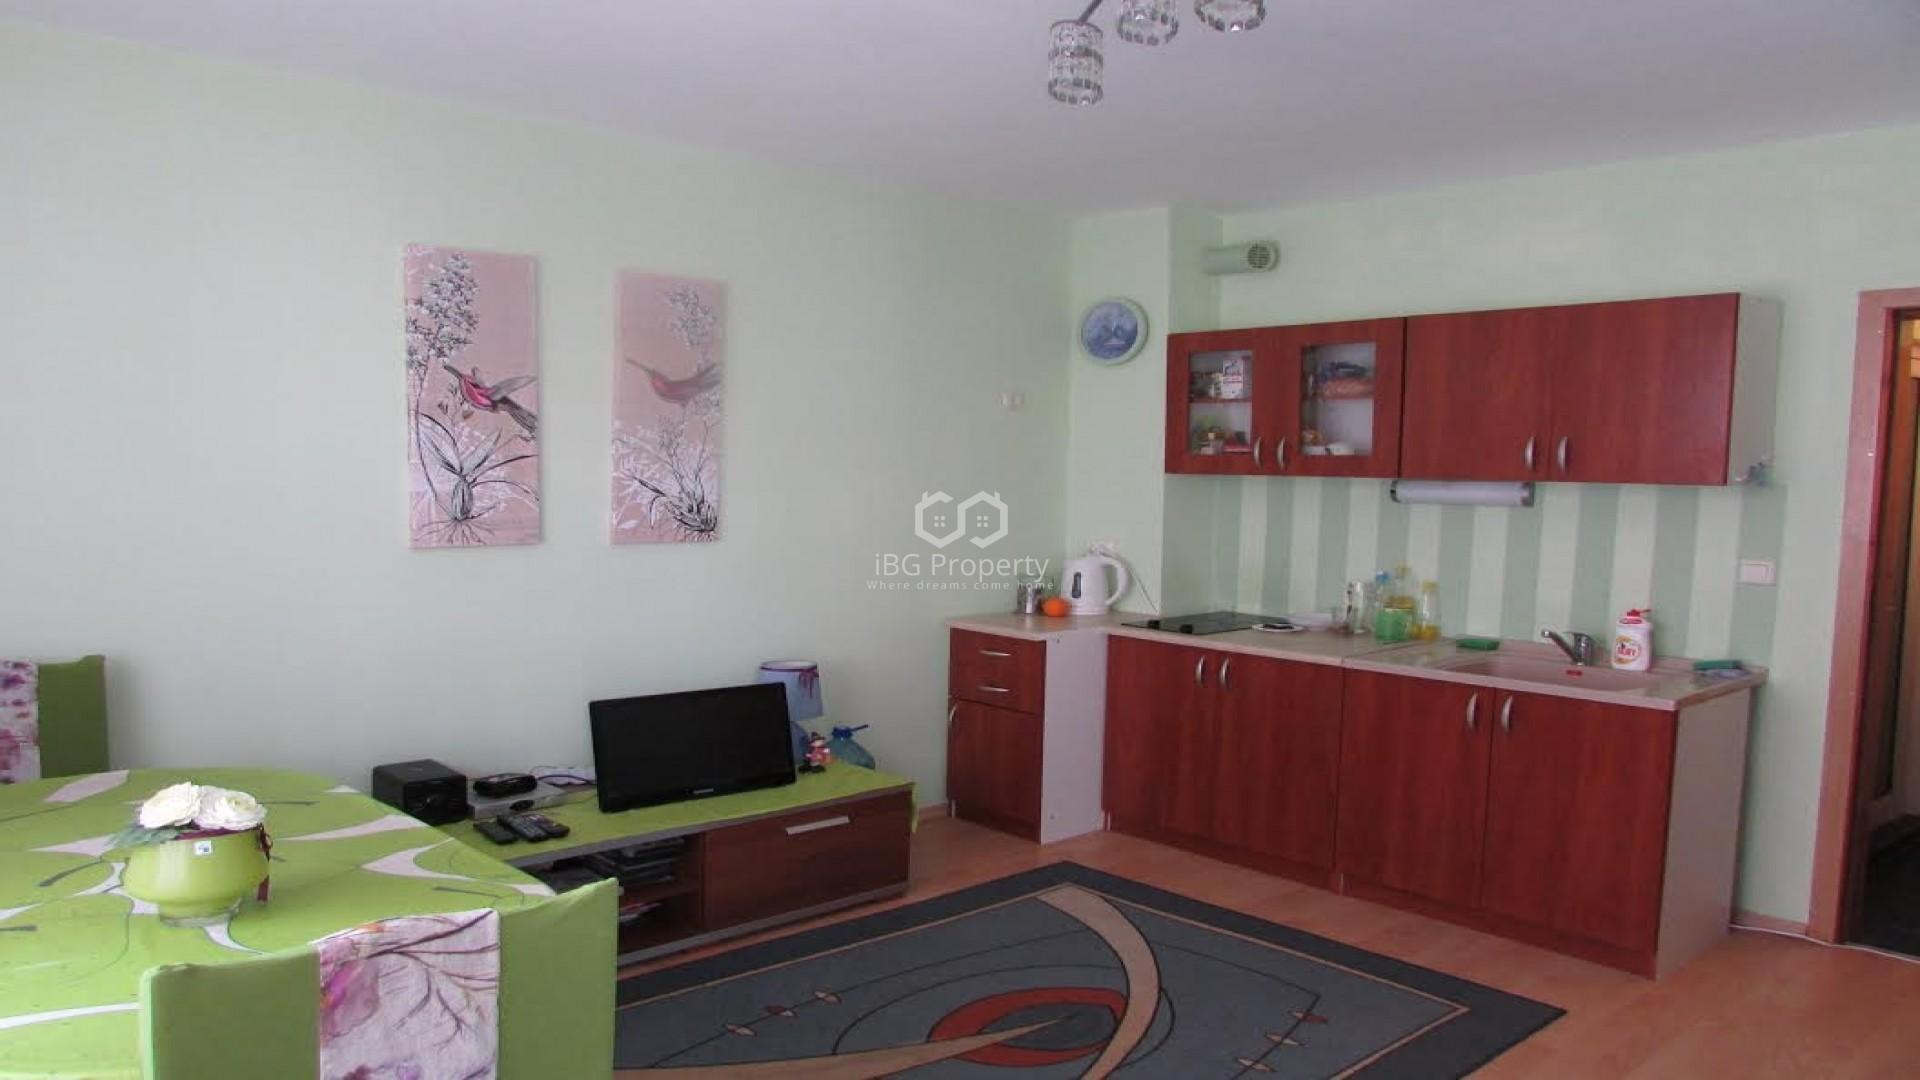 Двухкомнатная квартира Равда 46 m2